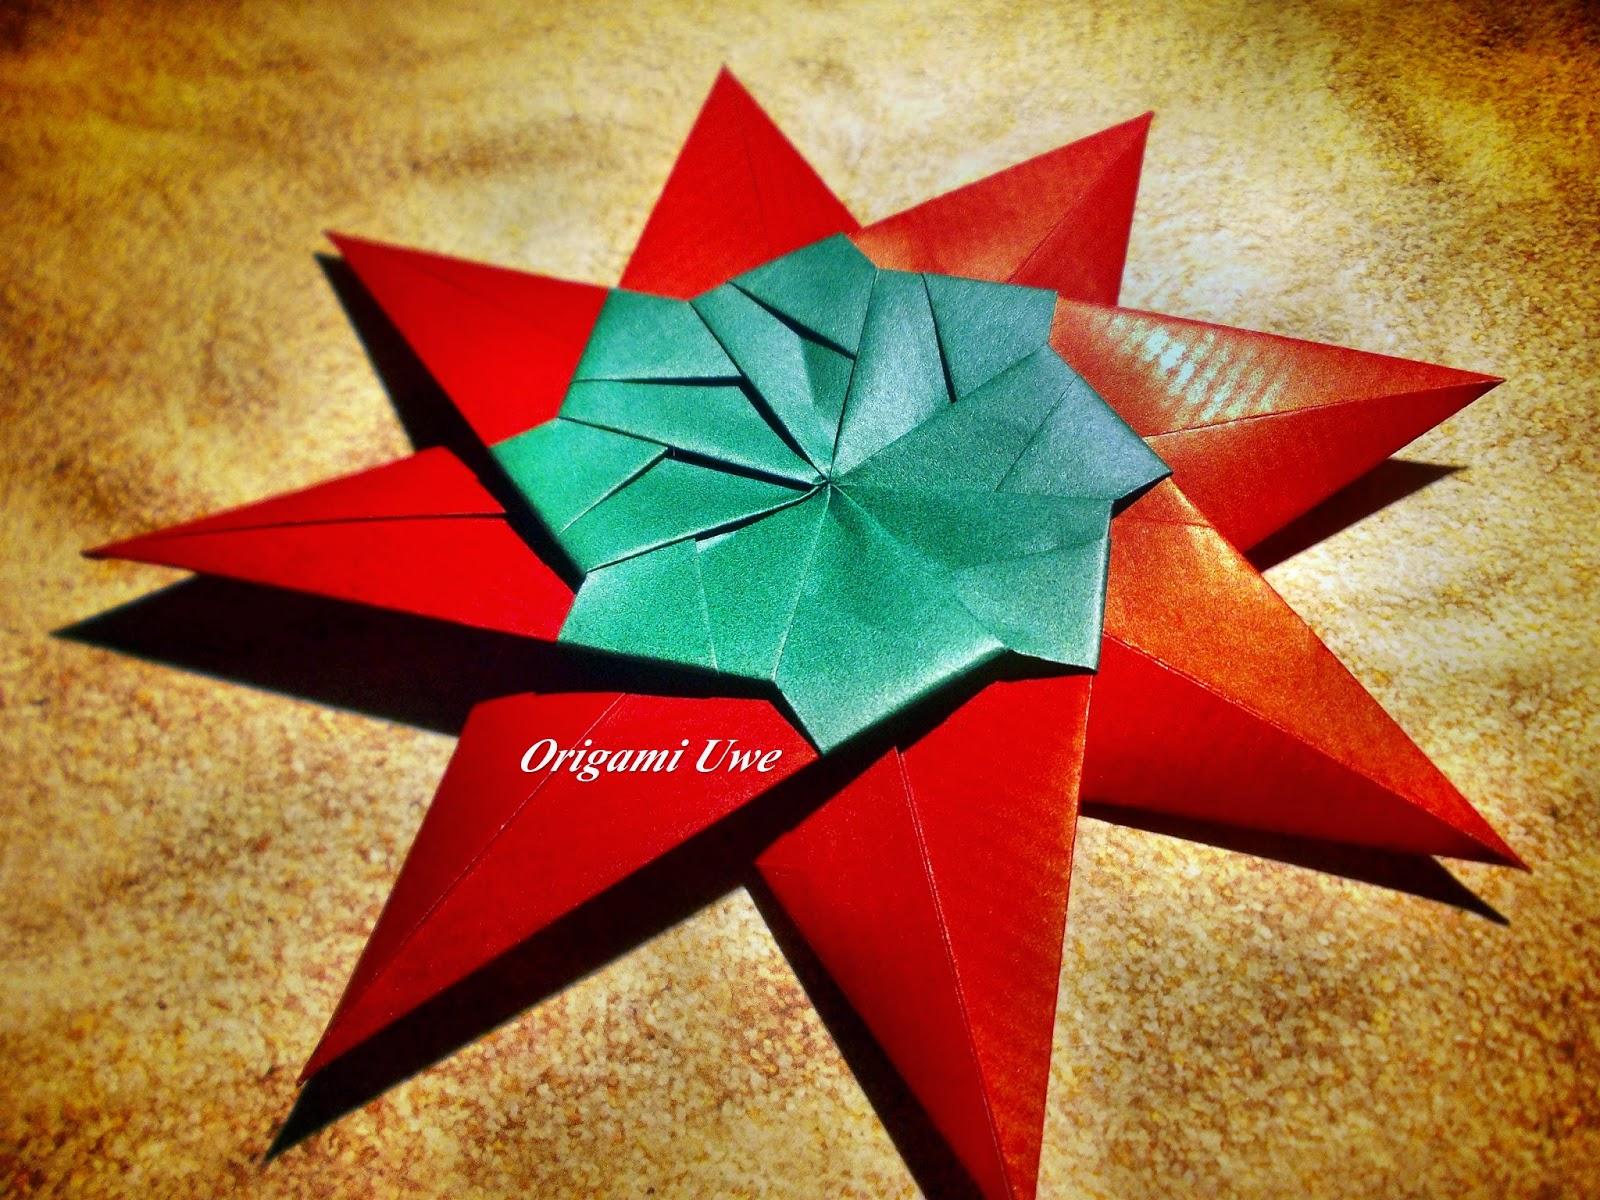 origami fleurogami und sterne modular origami star teil 2. Black Bedroom Furniture Sets. Home Design Ideas